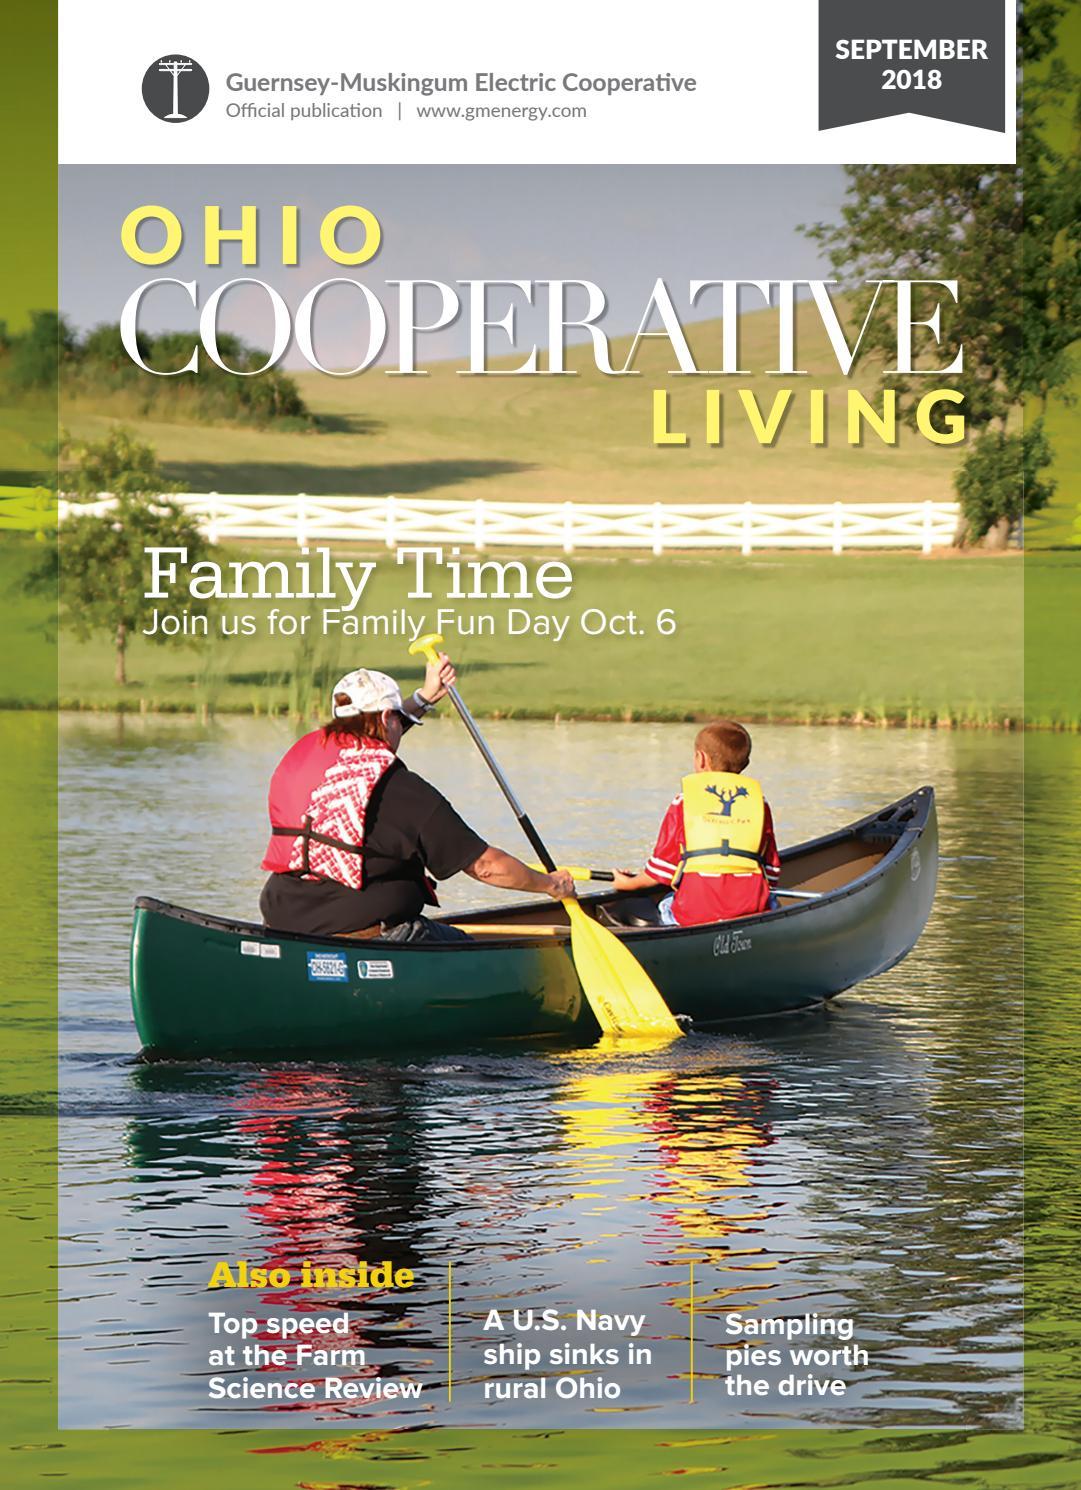 Ohio Cooperative Living September 2018 Guernsey